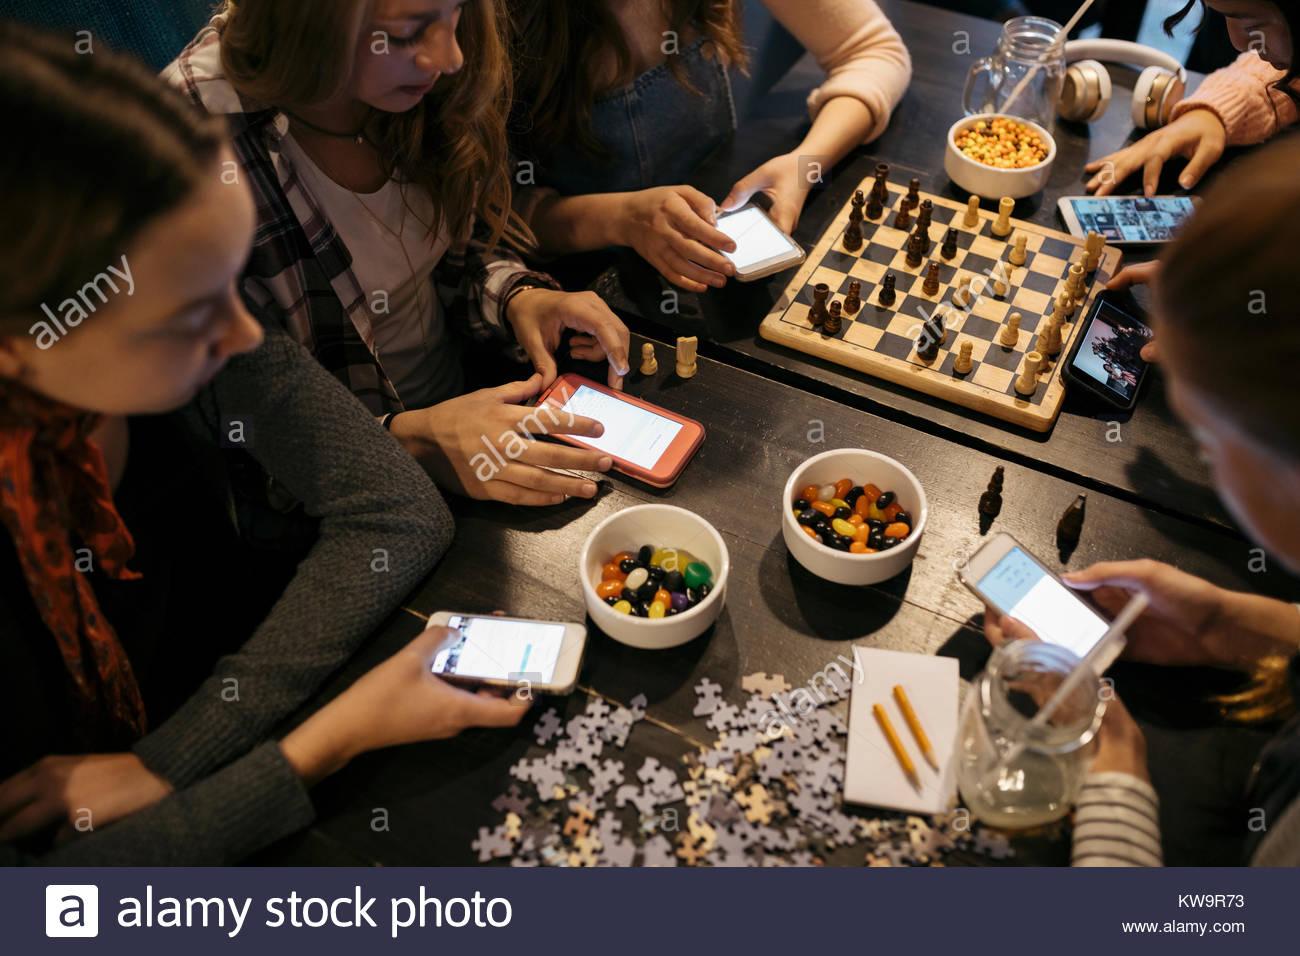 Le Tween girl friends jouer aux échecs,assemblage jigsaw puzzle et texting with smart phones at table Photo Stock